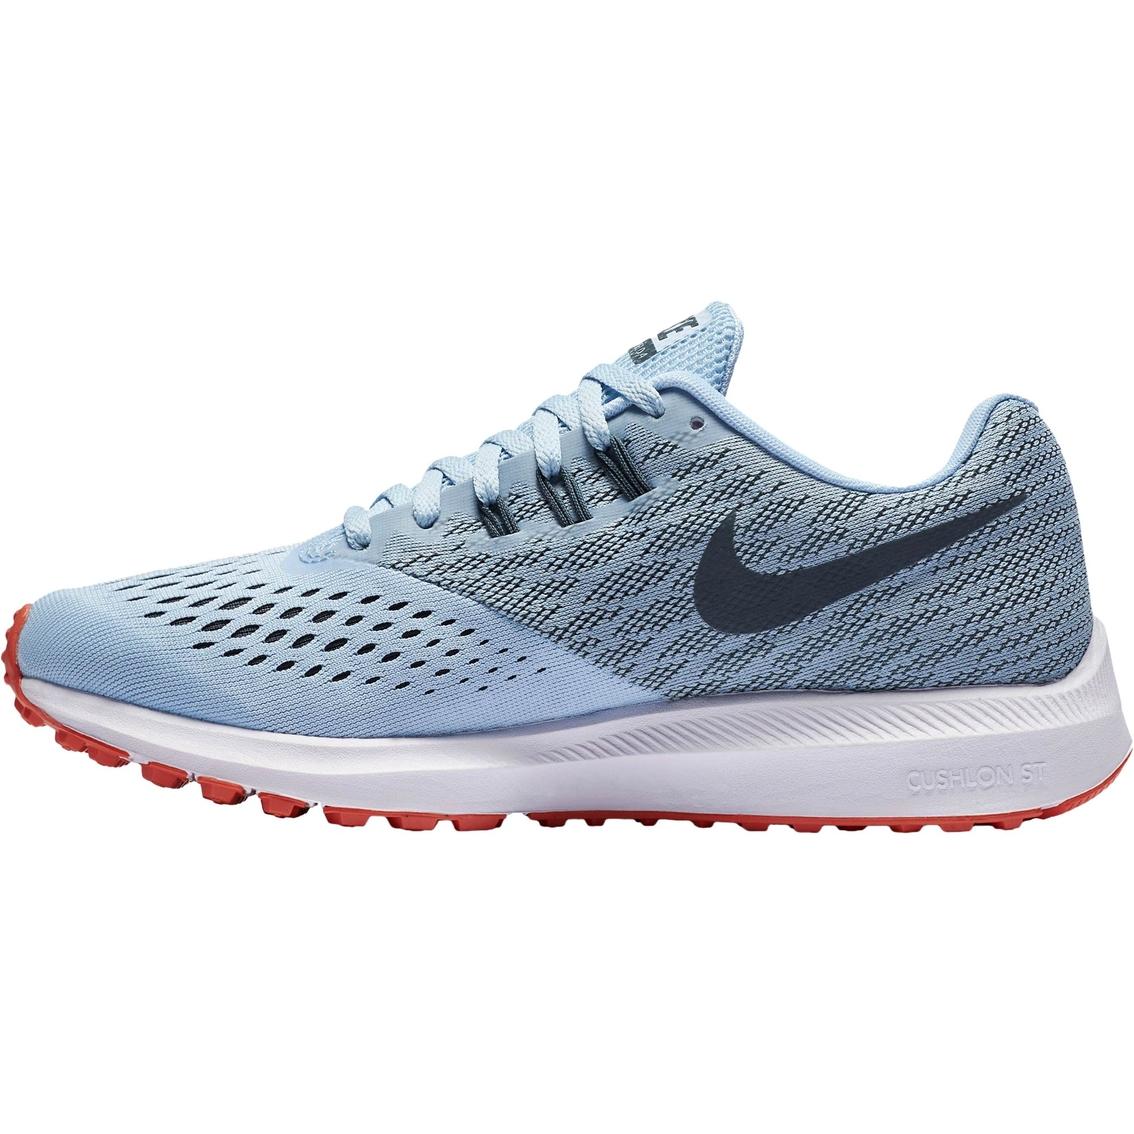 63ae18621cac1 Nike Women s Zoom Winflo 4 Running Shoes